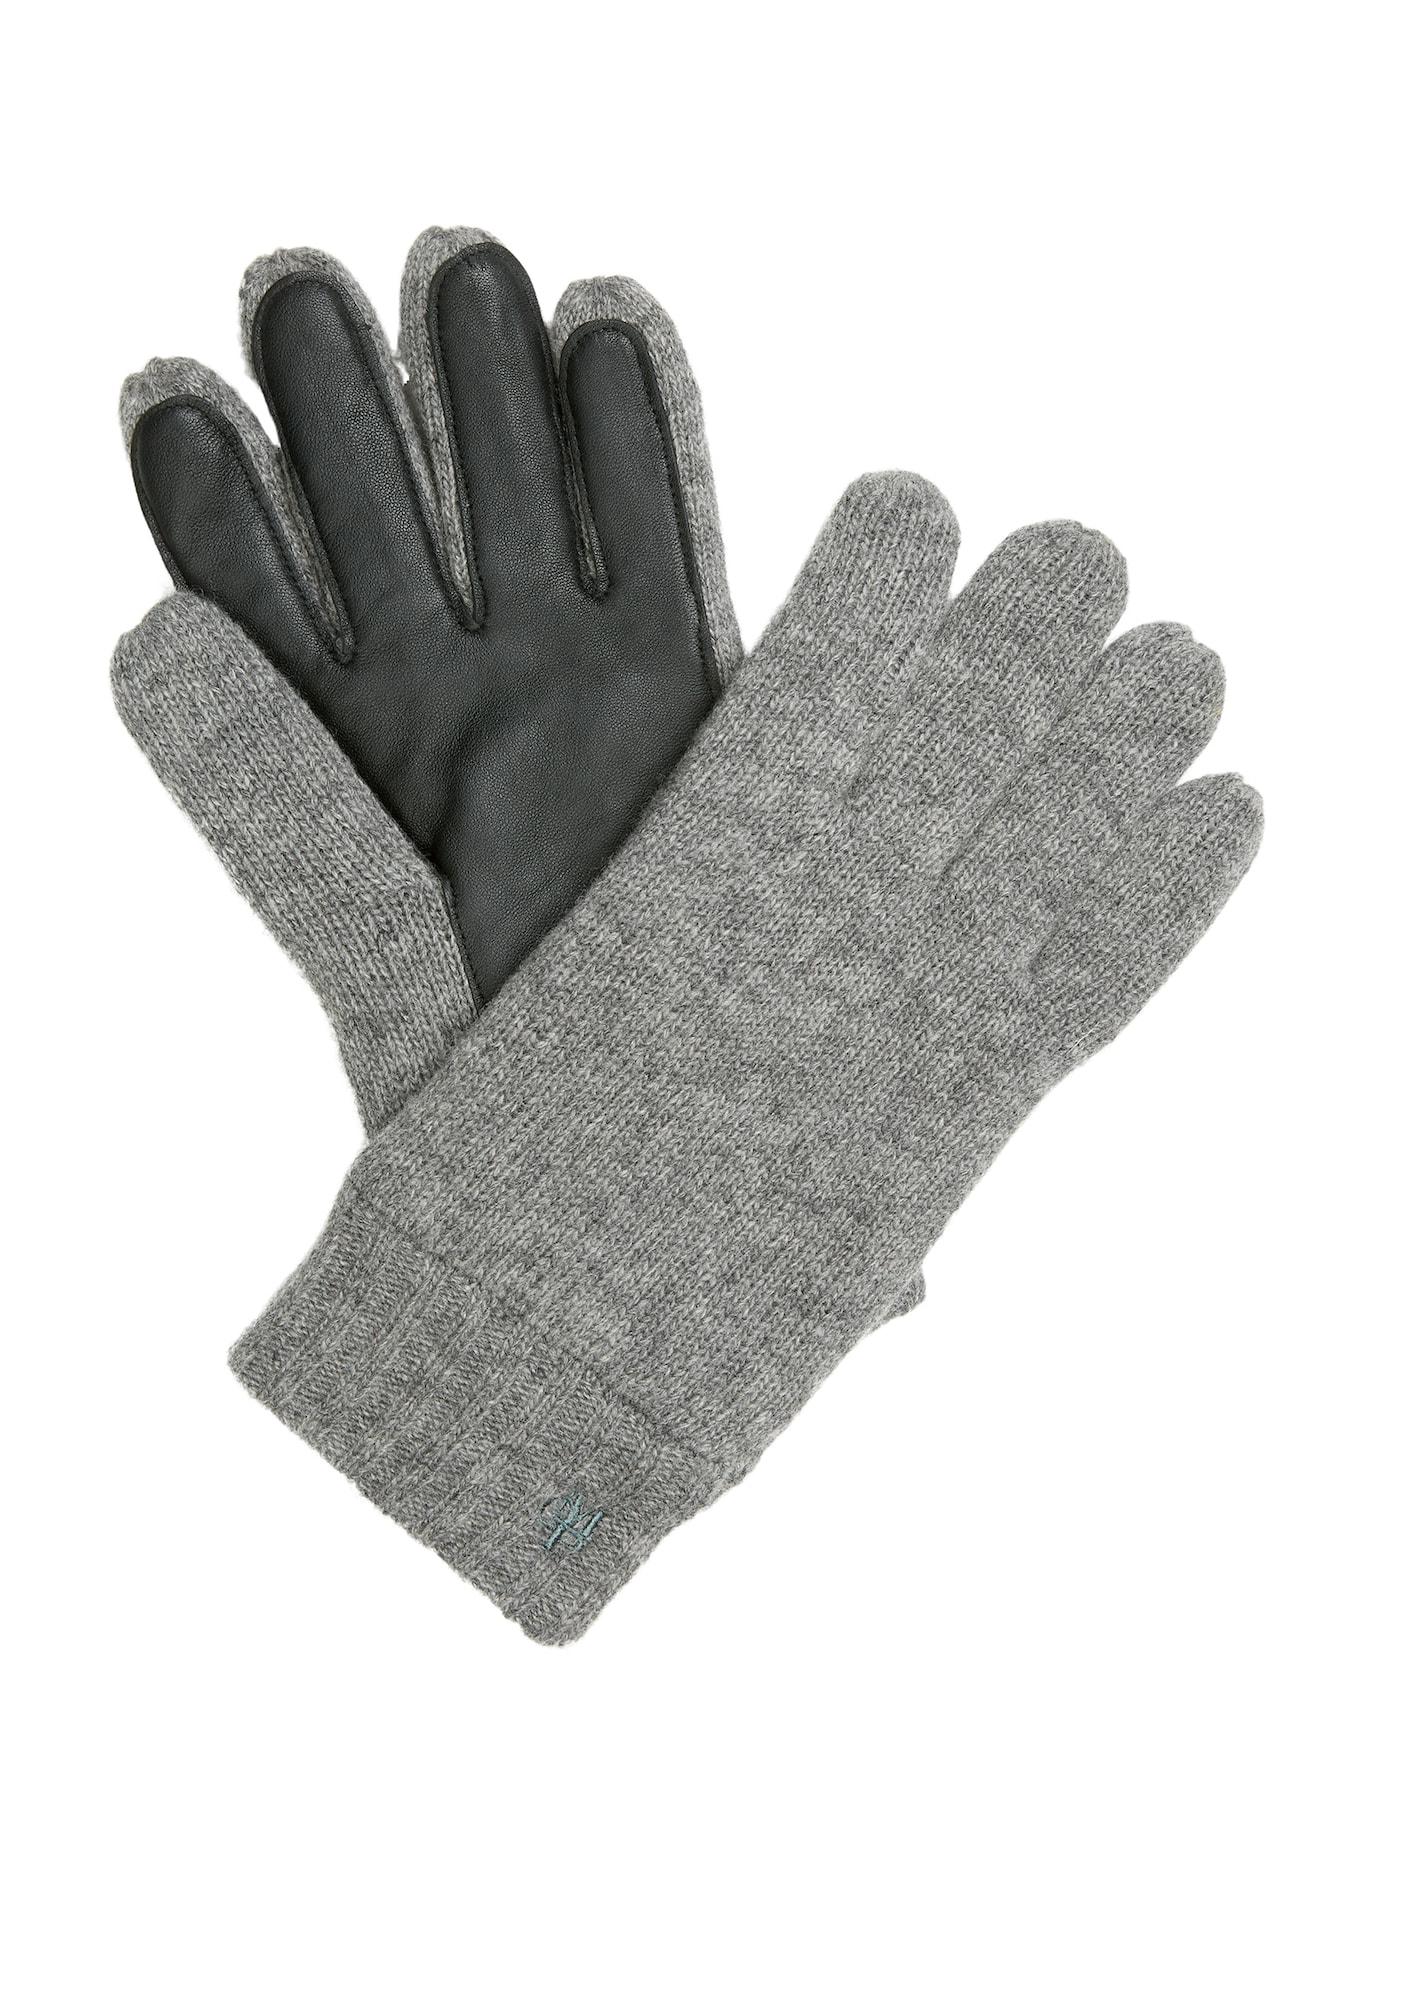 Handschuhe   Accessoires > Handschuhe > Sonstige Handschuhe   Marc O'Polo